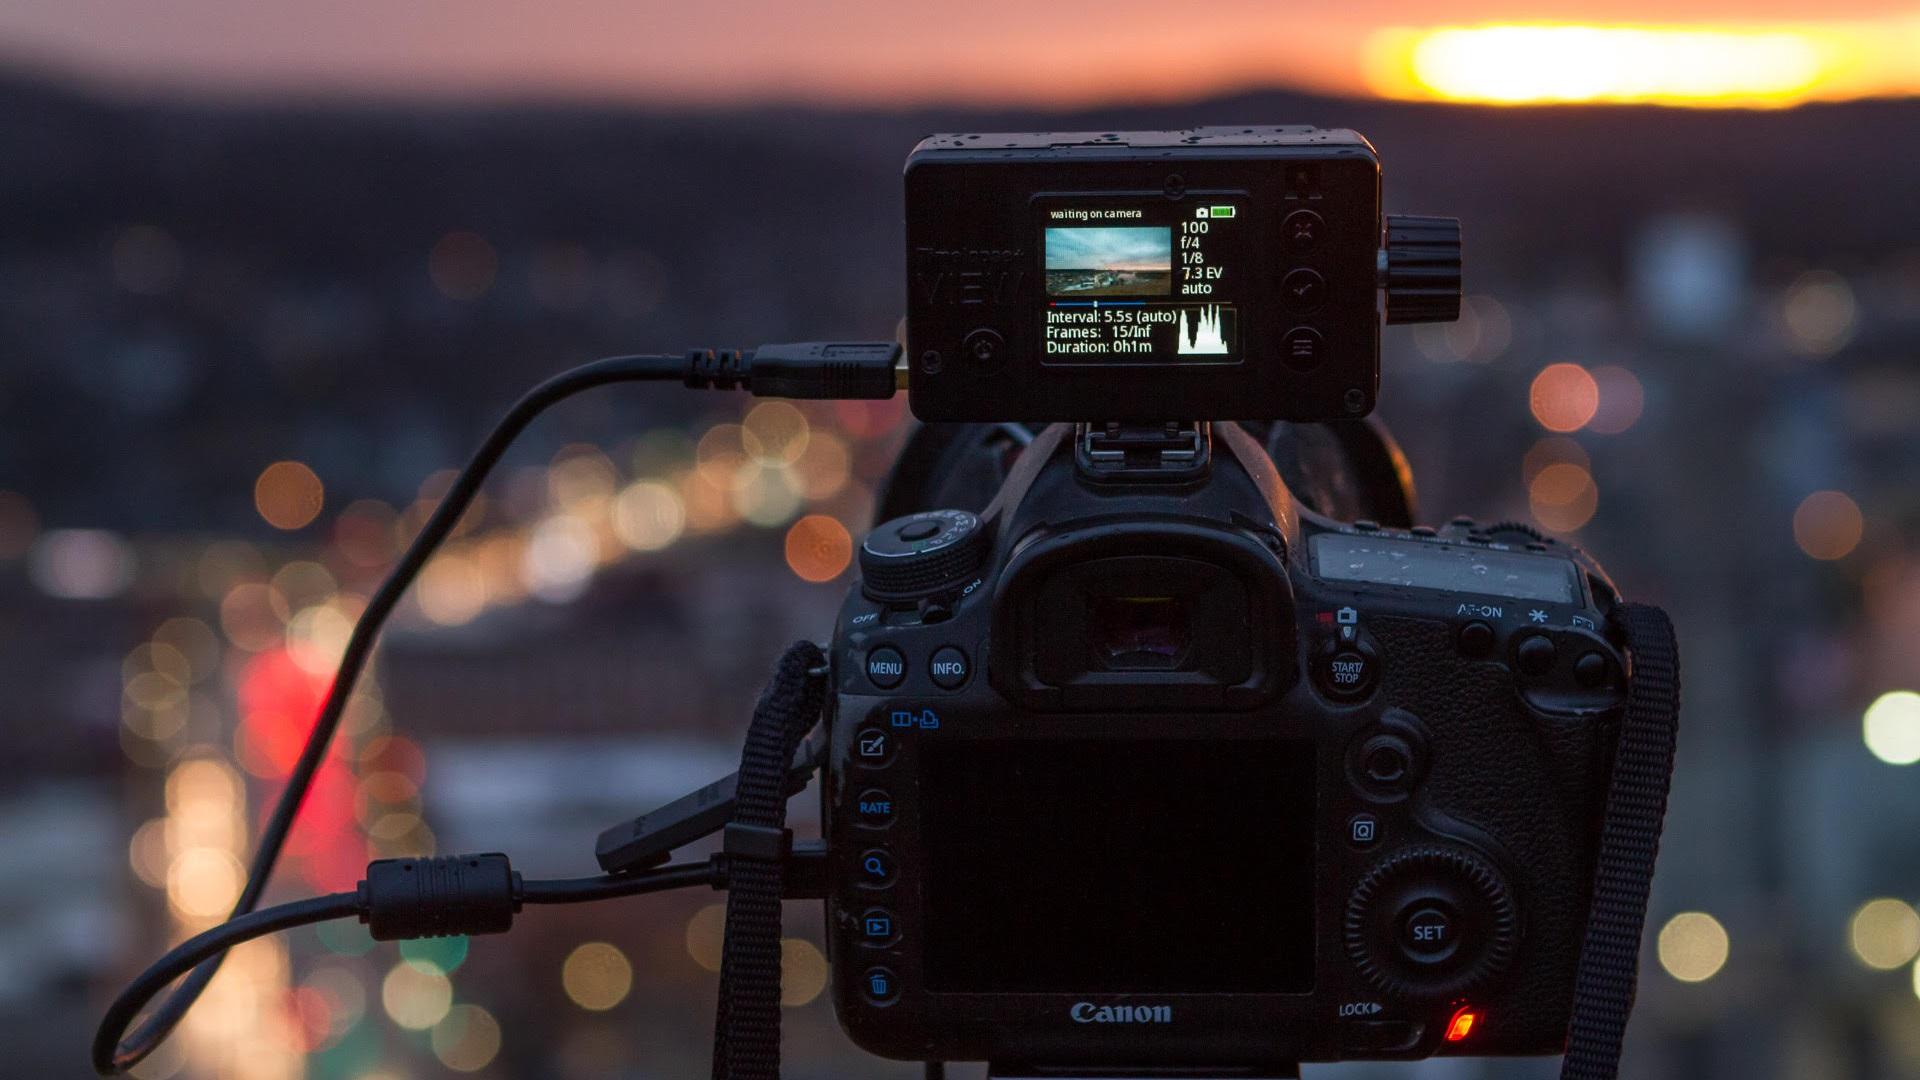 Actualización 1.8 del Timelapse+ VIEW – agrega un nuevo controlador de cámara CORE USB